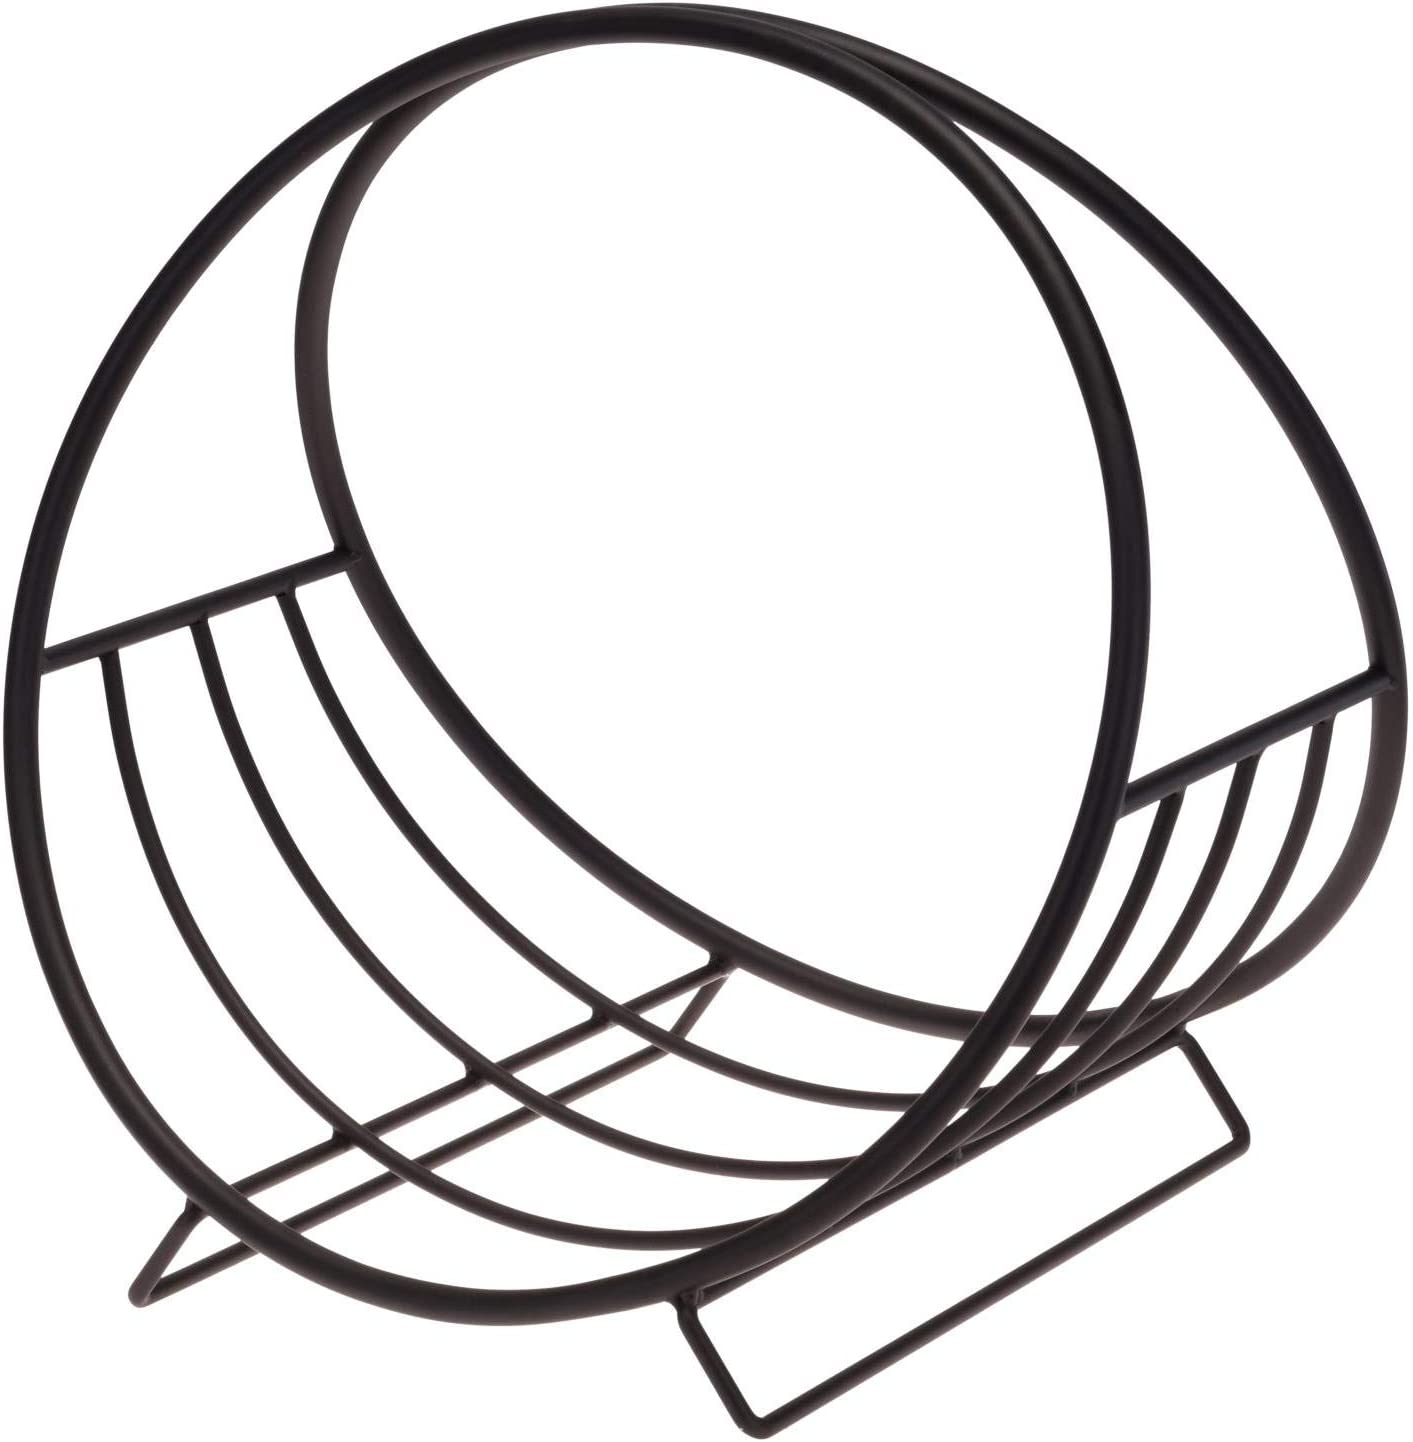 idooka Large Round Circular Log Storage Industrial Black Coated Finish Stylish Black Metal Finish Firewood Storage Holder Ventilation for Wood Diameter 55cm Solid base Indoor Outdoor Usage